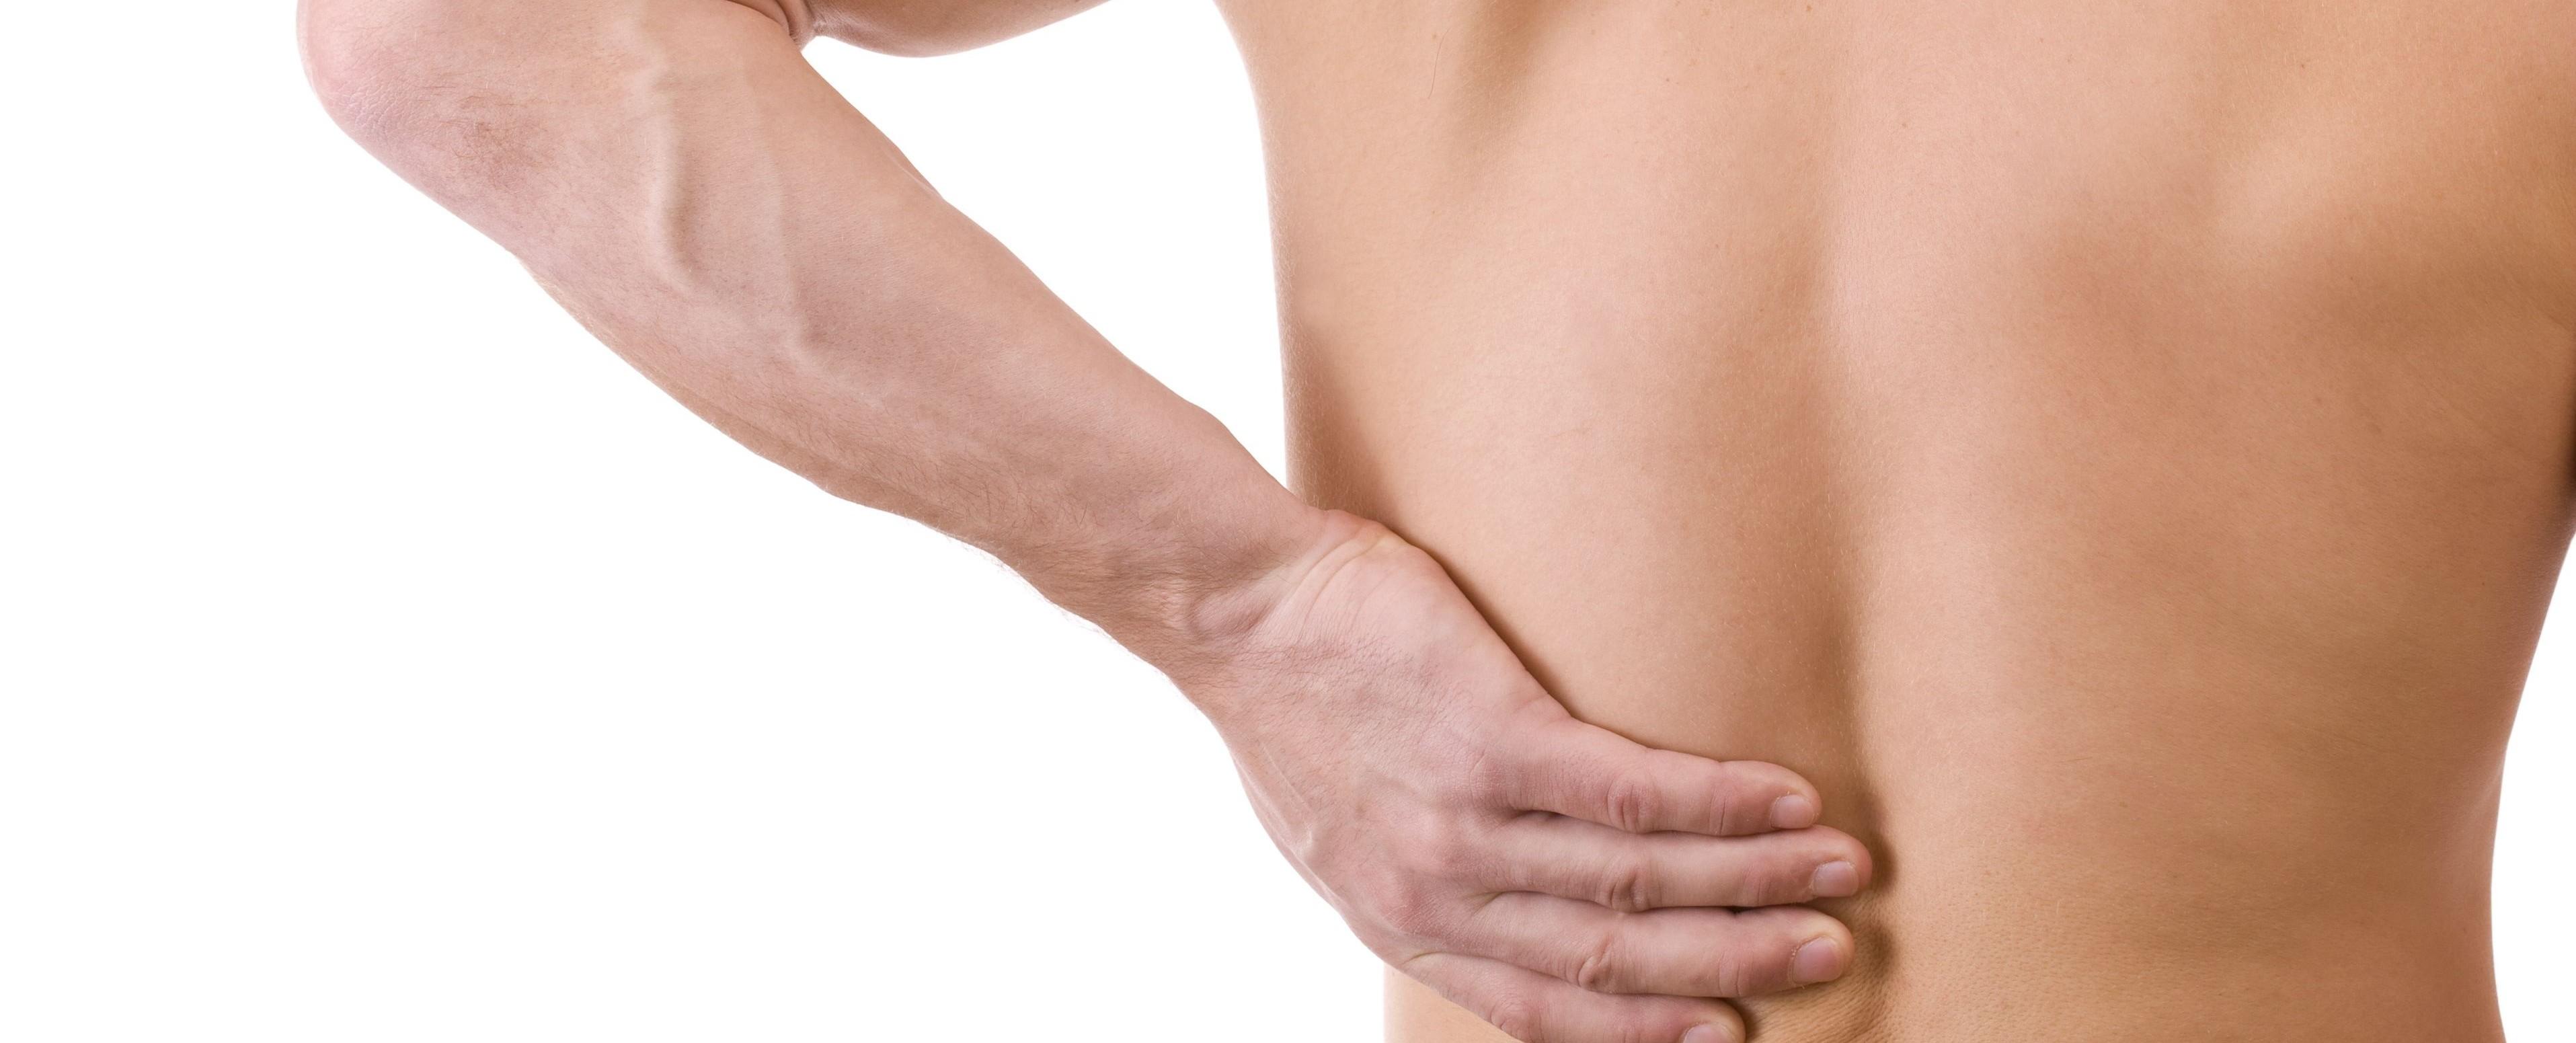 lower-back-pain-e1463857733817